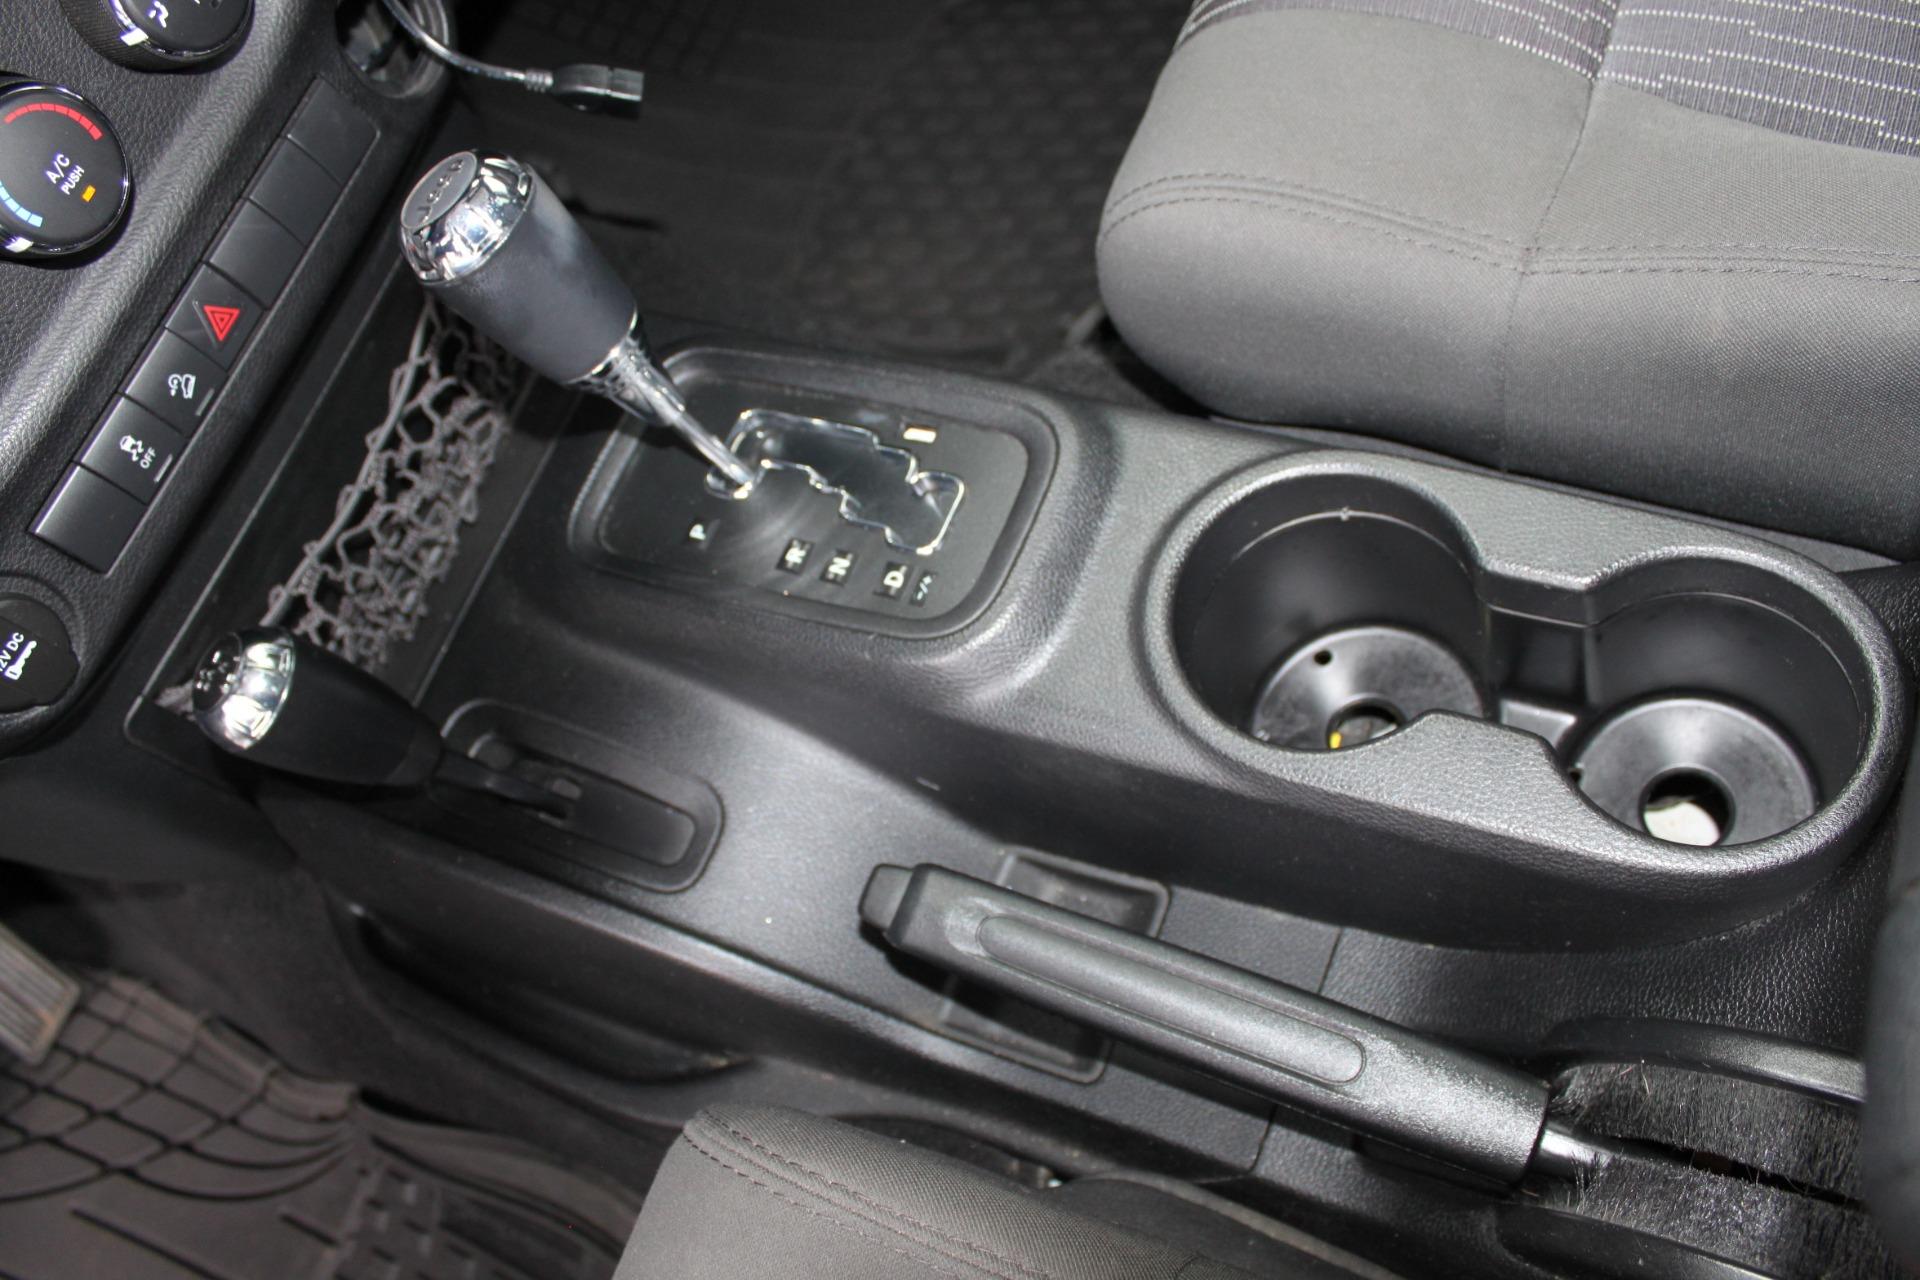 Used-2012-Jeep-Wrangler-Freedom-Edition-4X4-Range-Rover